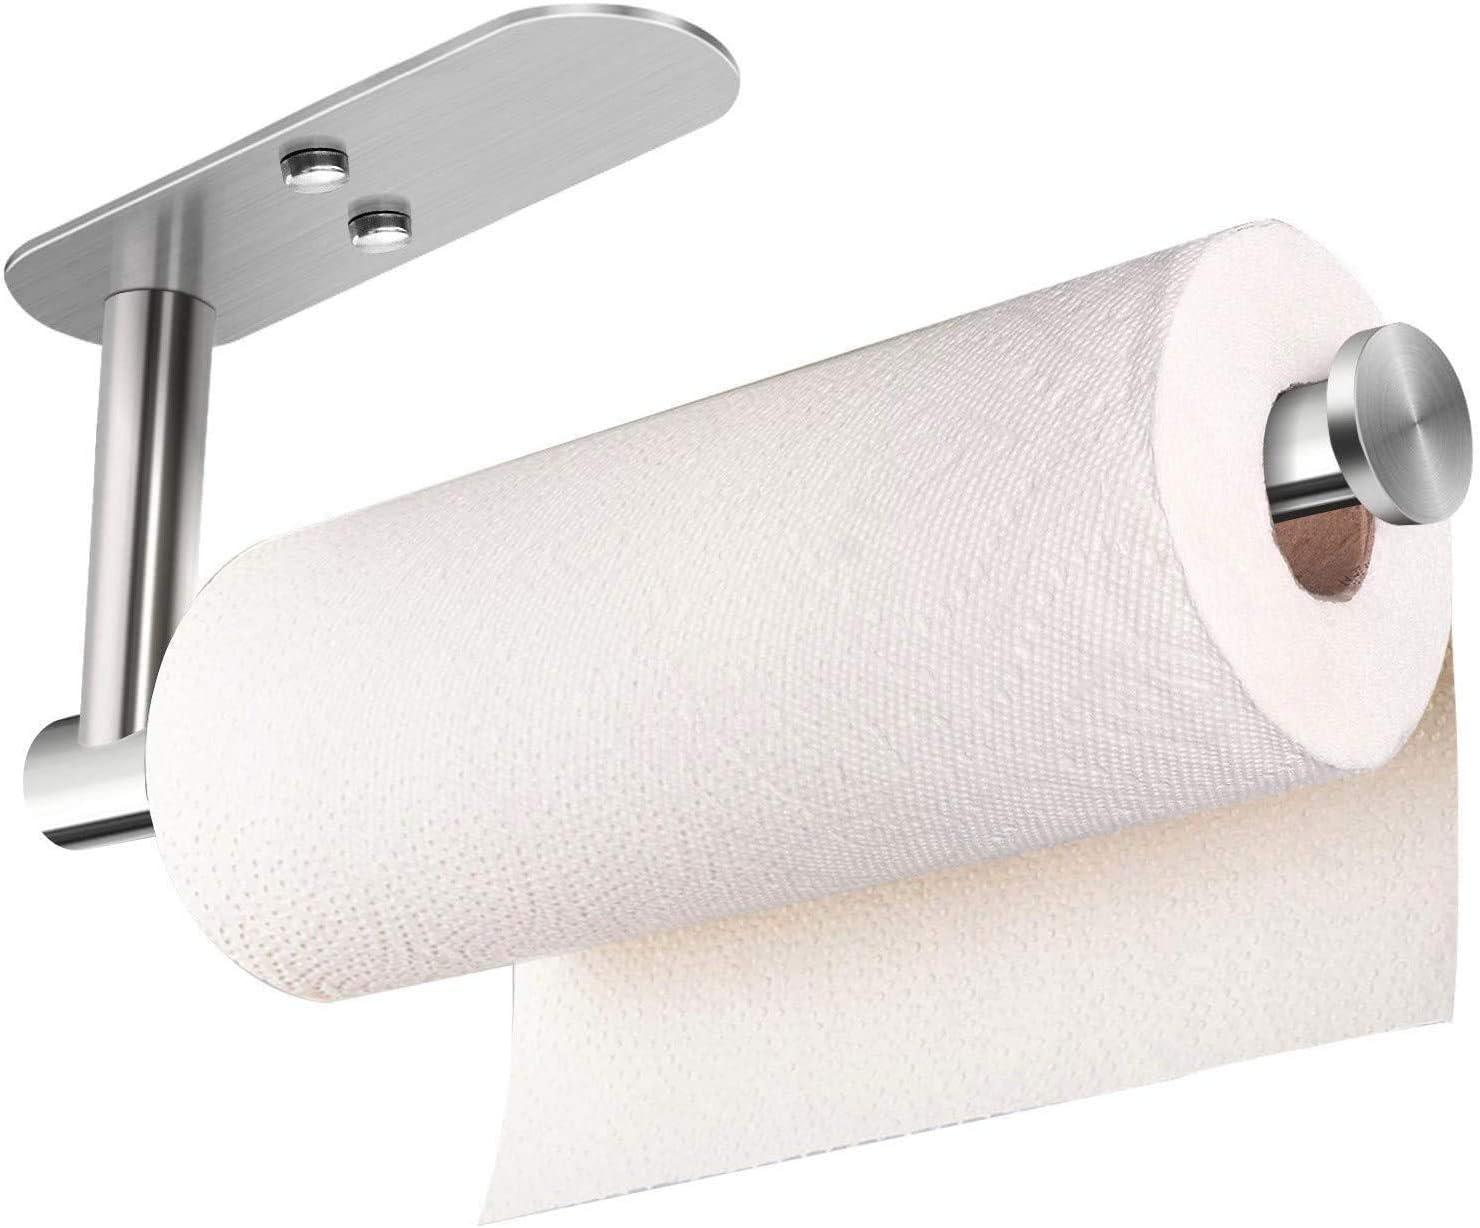 Paper Towel Holder Wall Under Cabinet Mount Max 52% OFF [Alternative dealer] Kitchen